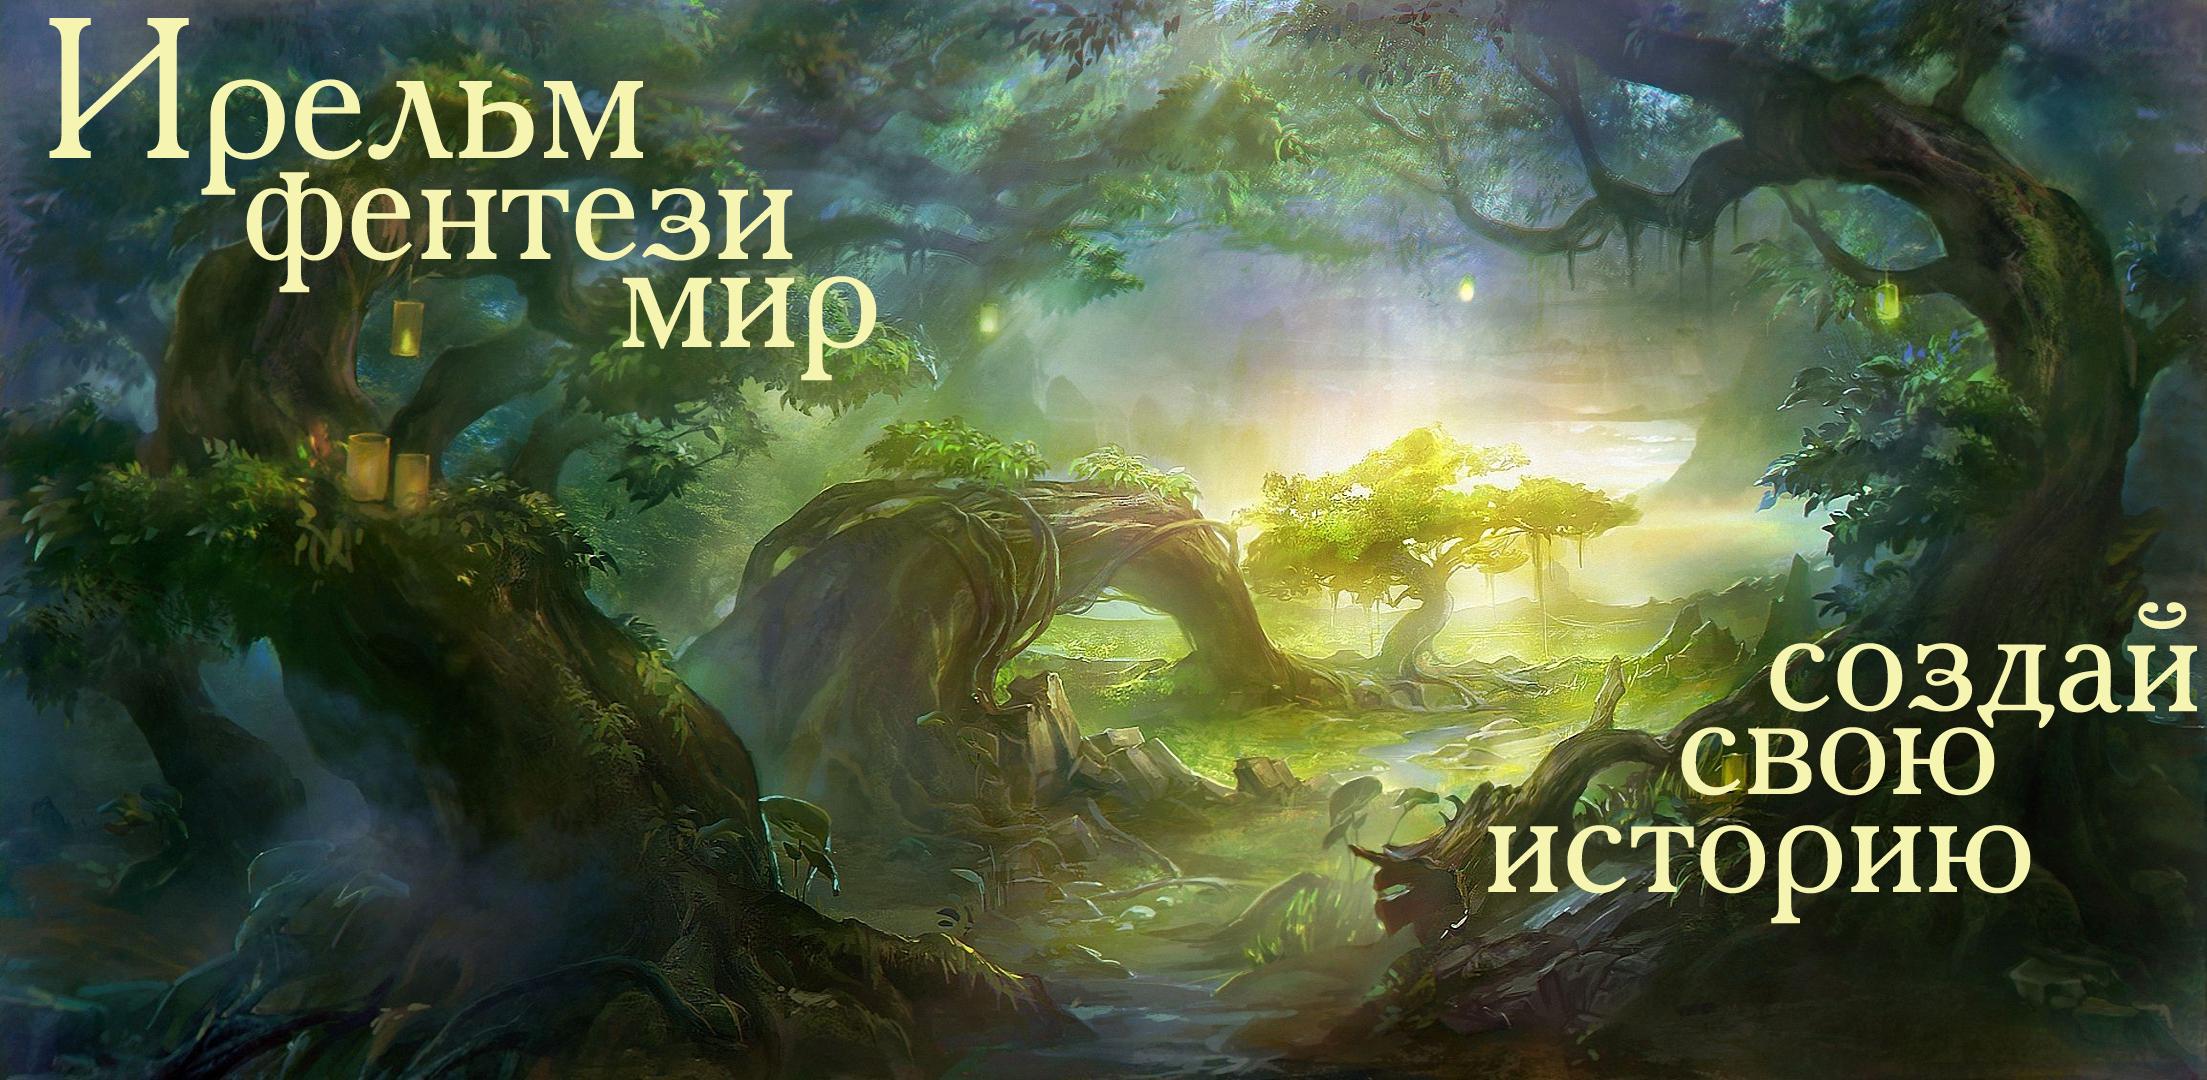 http://s6.uploads.ru/VcBh1.png